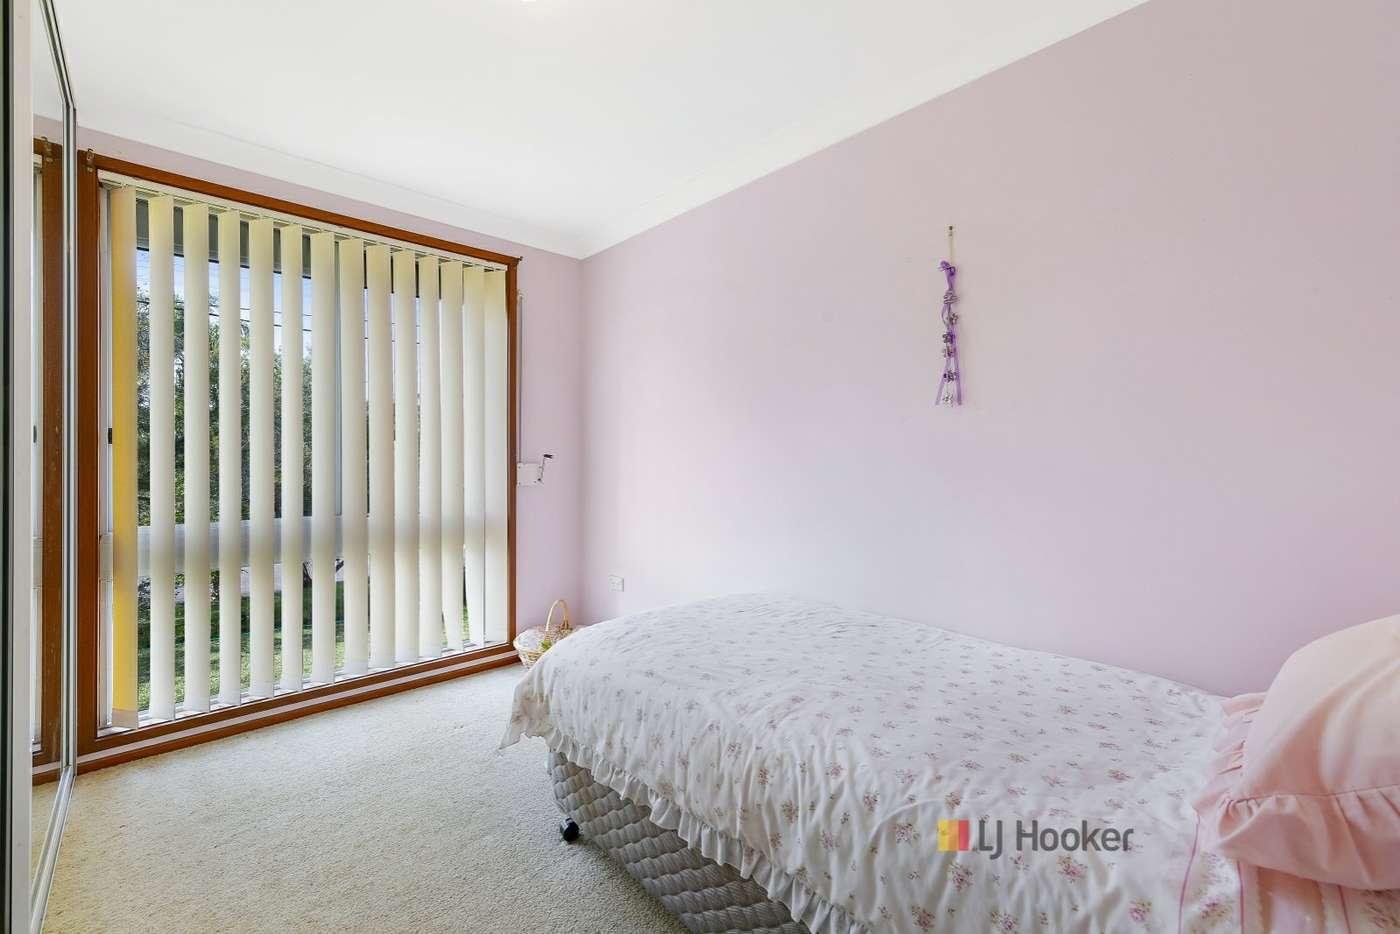 Fifth view of Homely house listing, 68 Doyle Avenue, Halekulani NSW 2262